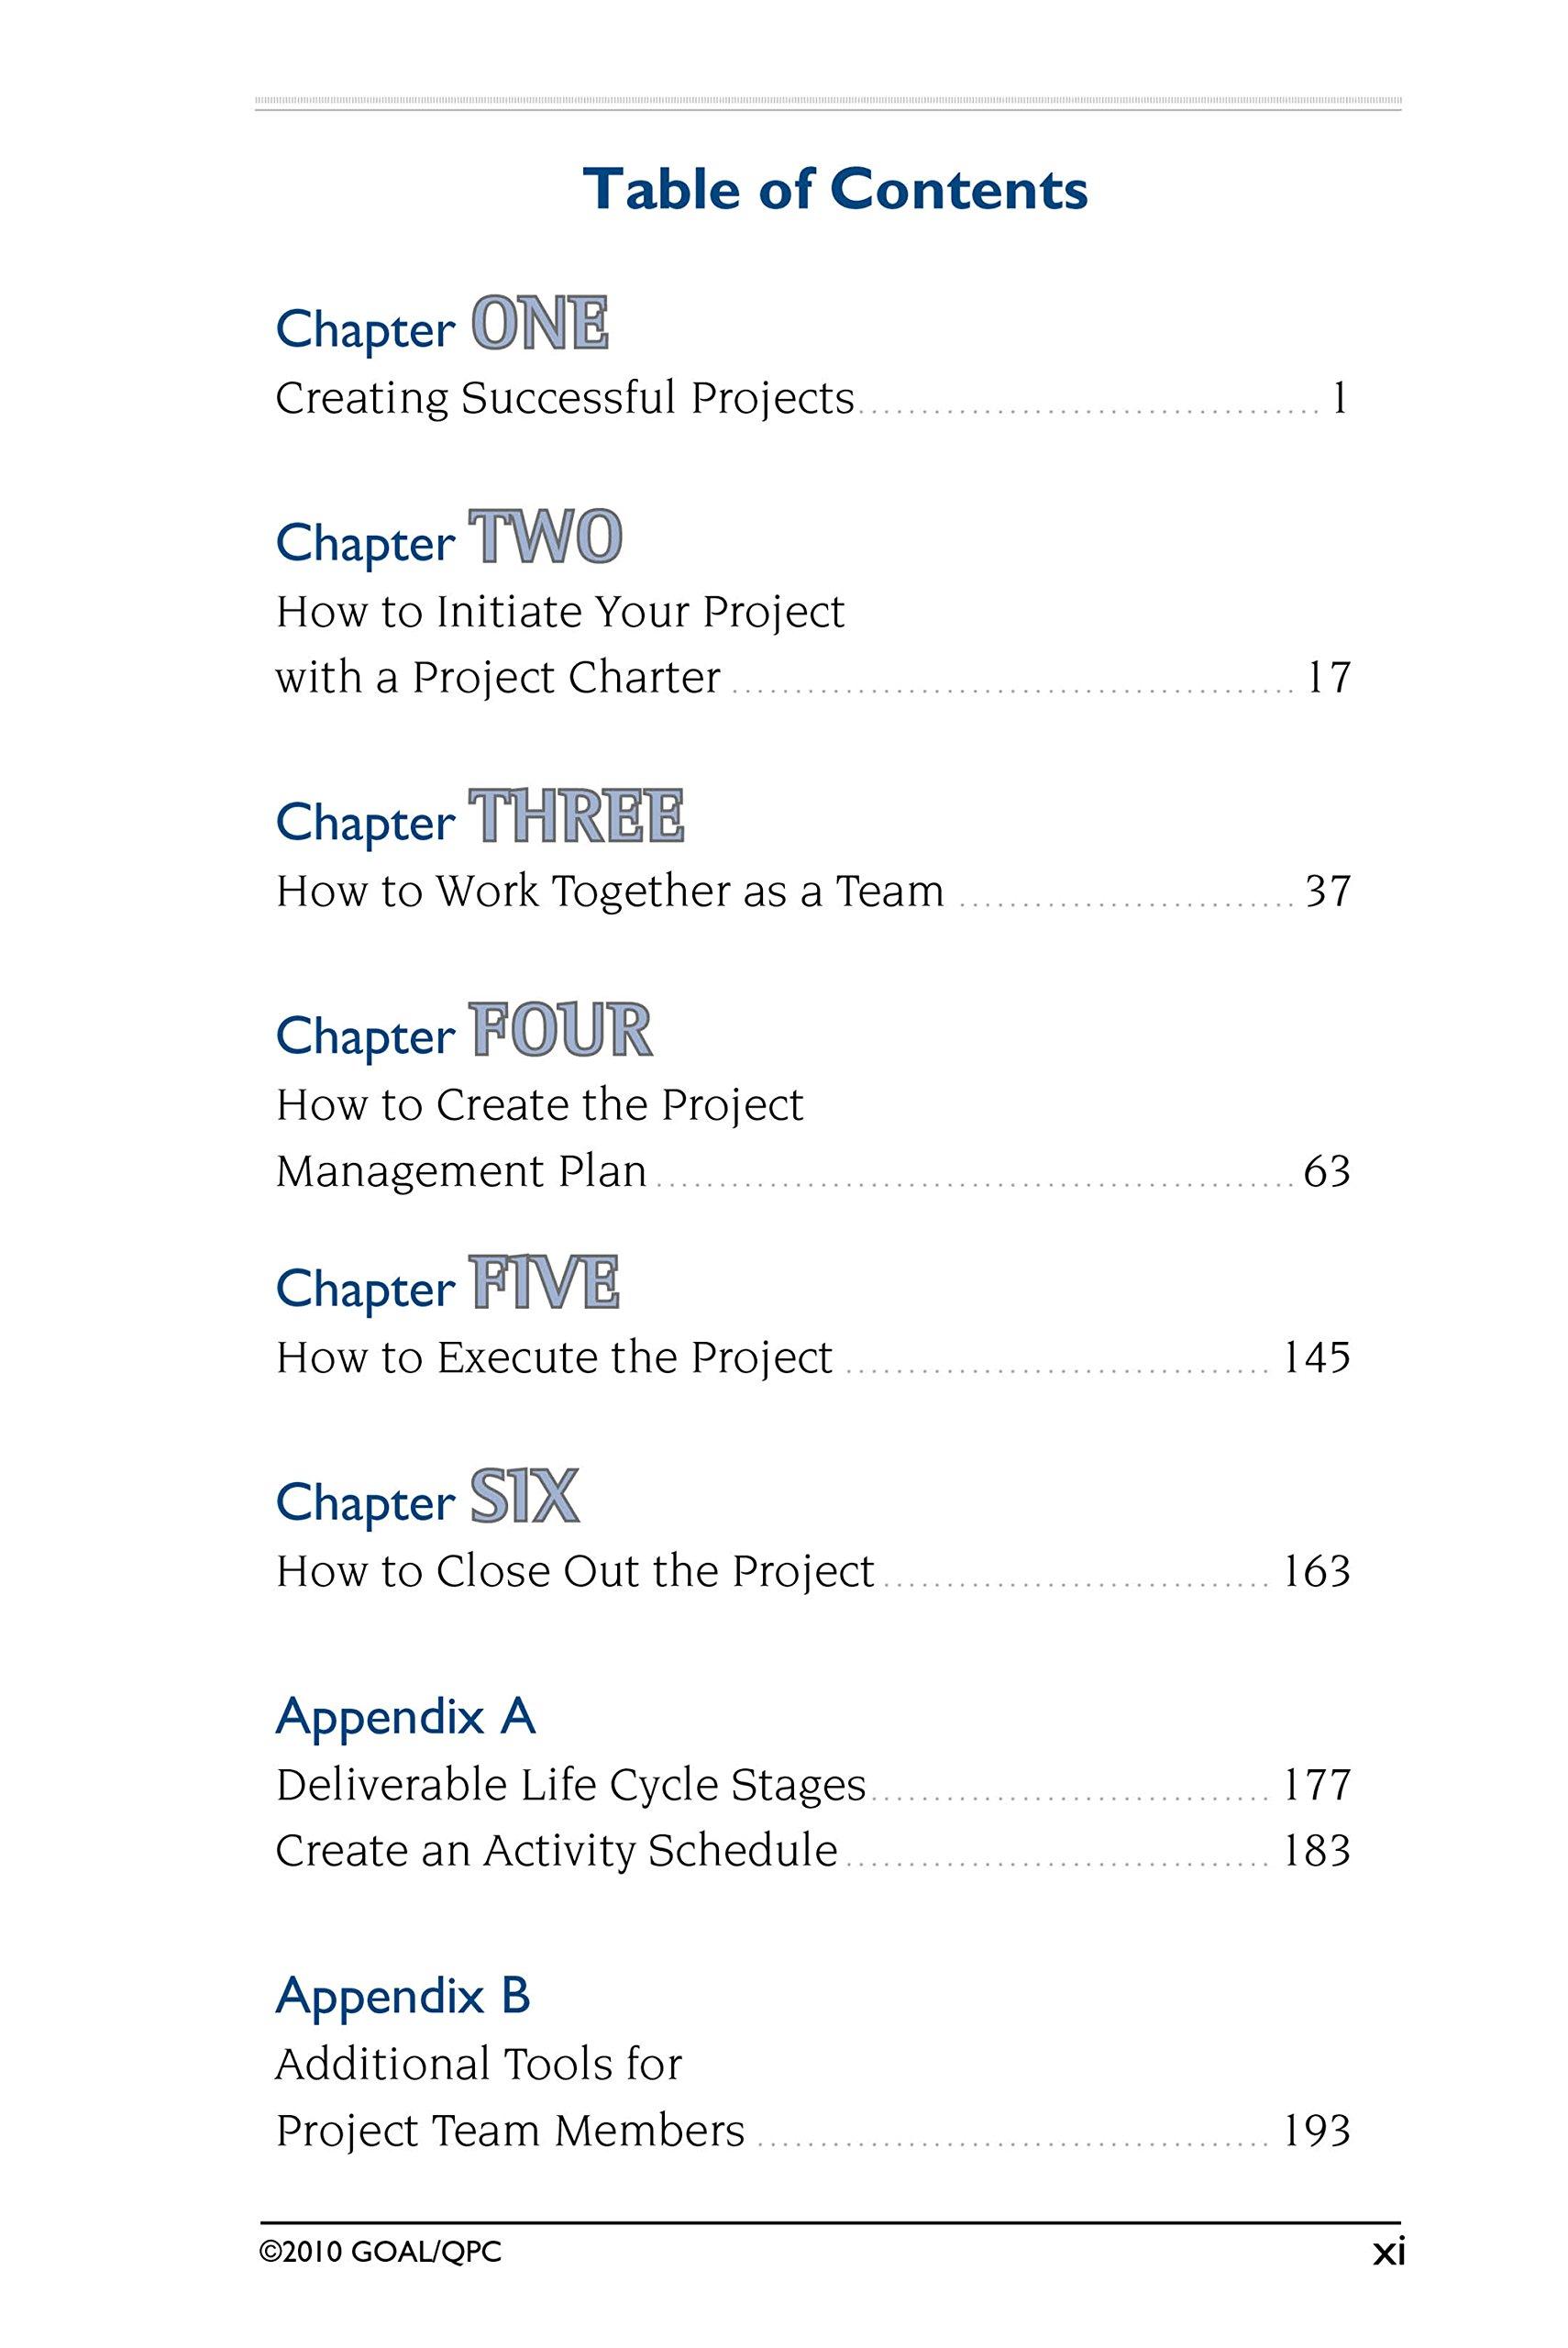 Amazon.com: The Project Management Memory Jogger (9781576811221): Karen  Tate, Paula Martin, GOAL/QPC: Books